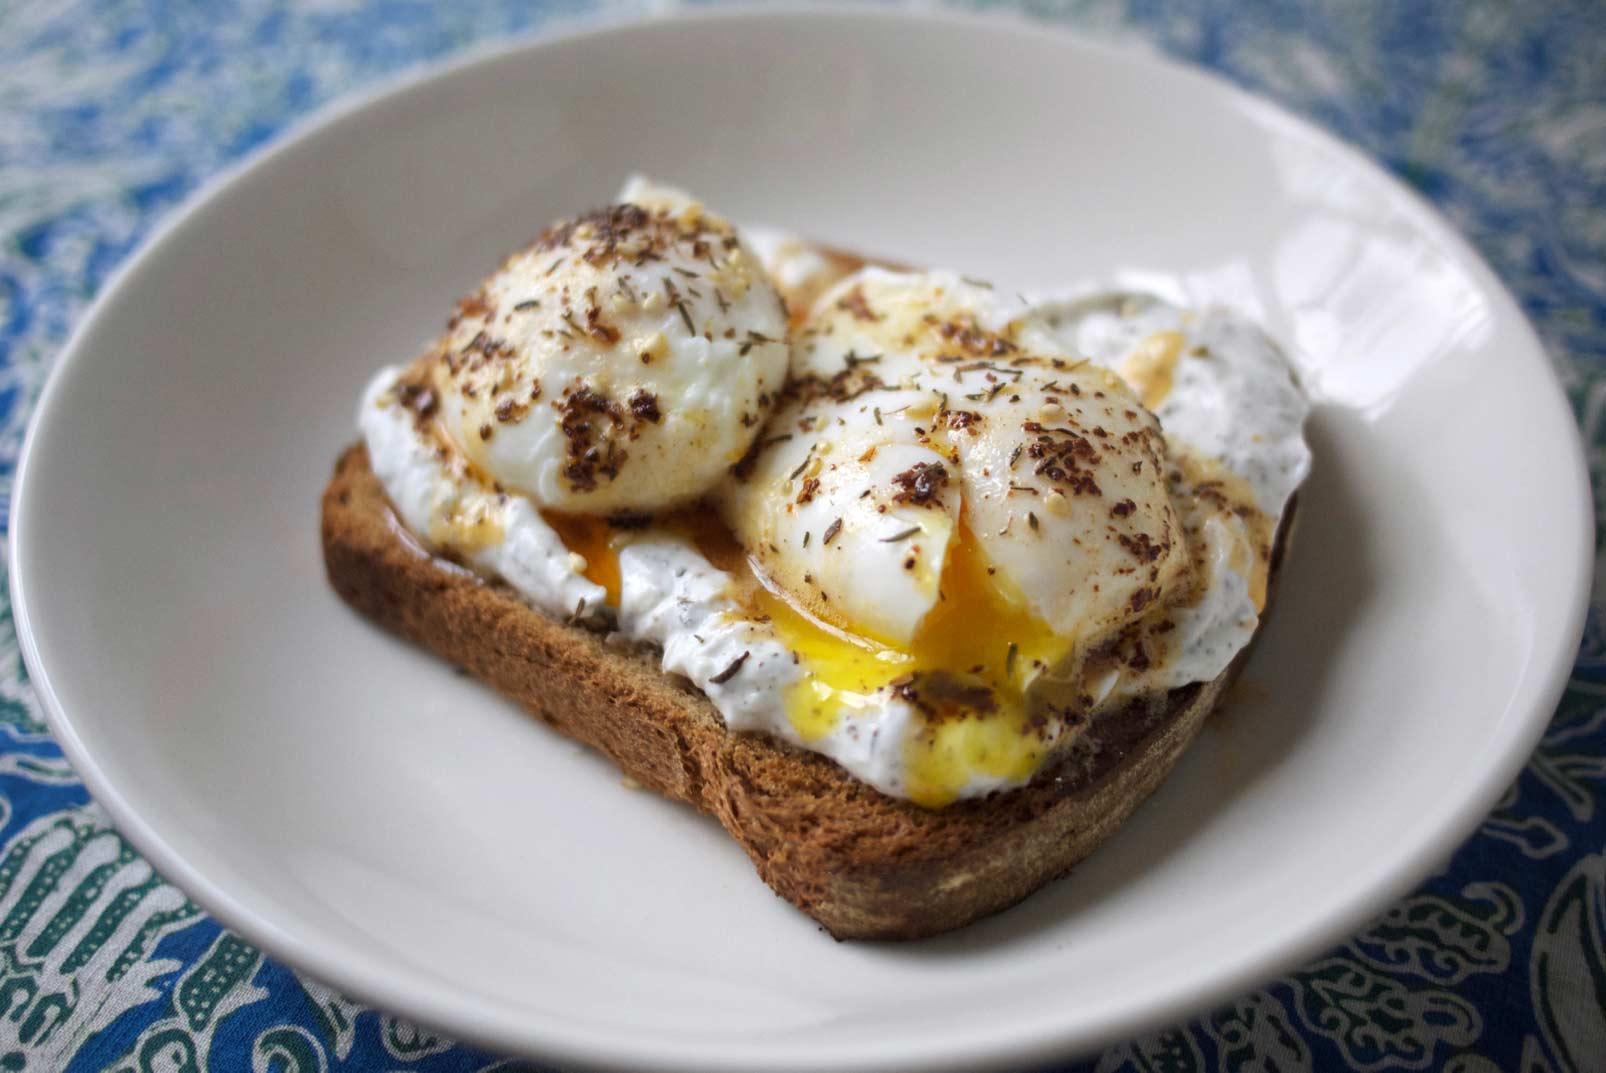 Poached Eggs with Garlic and Zahtar Yogurt